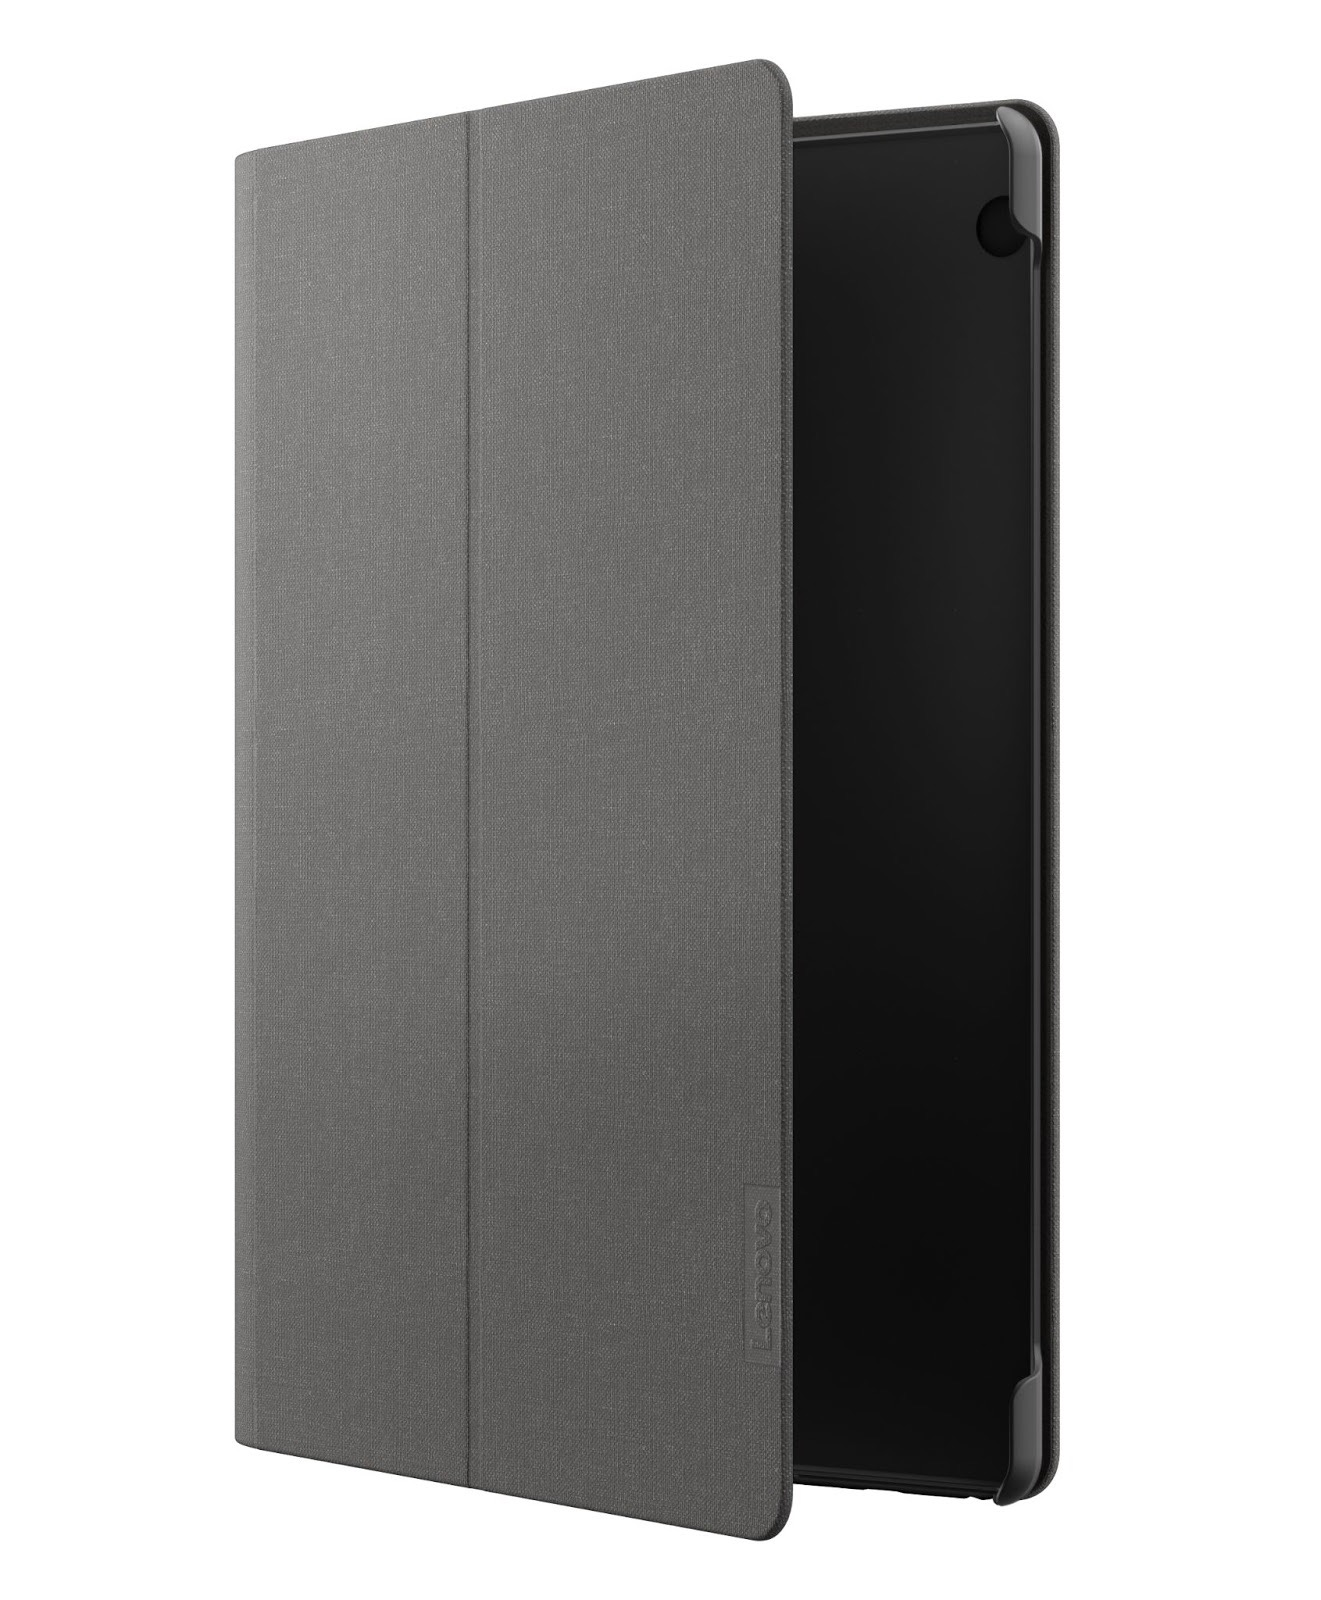 Фото 3. Чехол Lenovo Tab M10HD 2nd Folio Case/Film для TB-X306 (ZG38C03033)